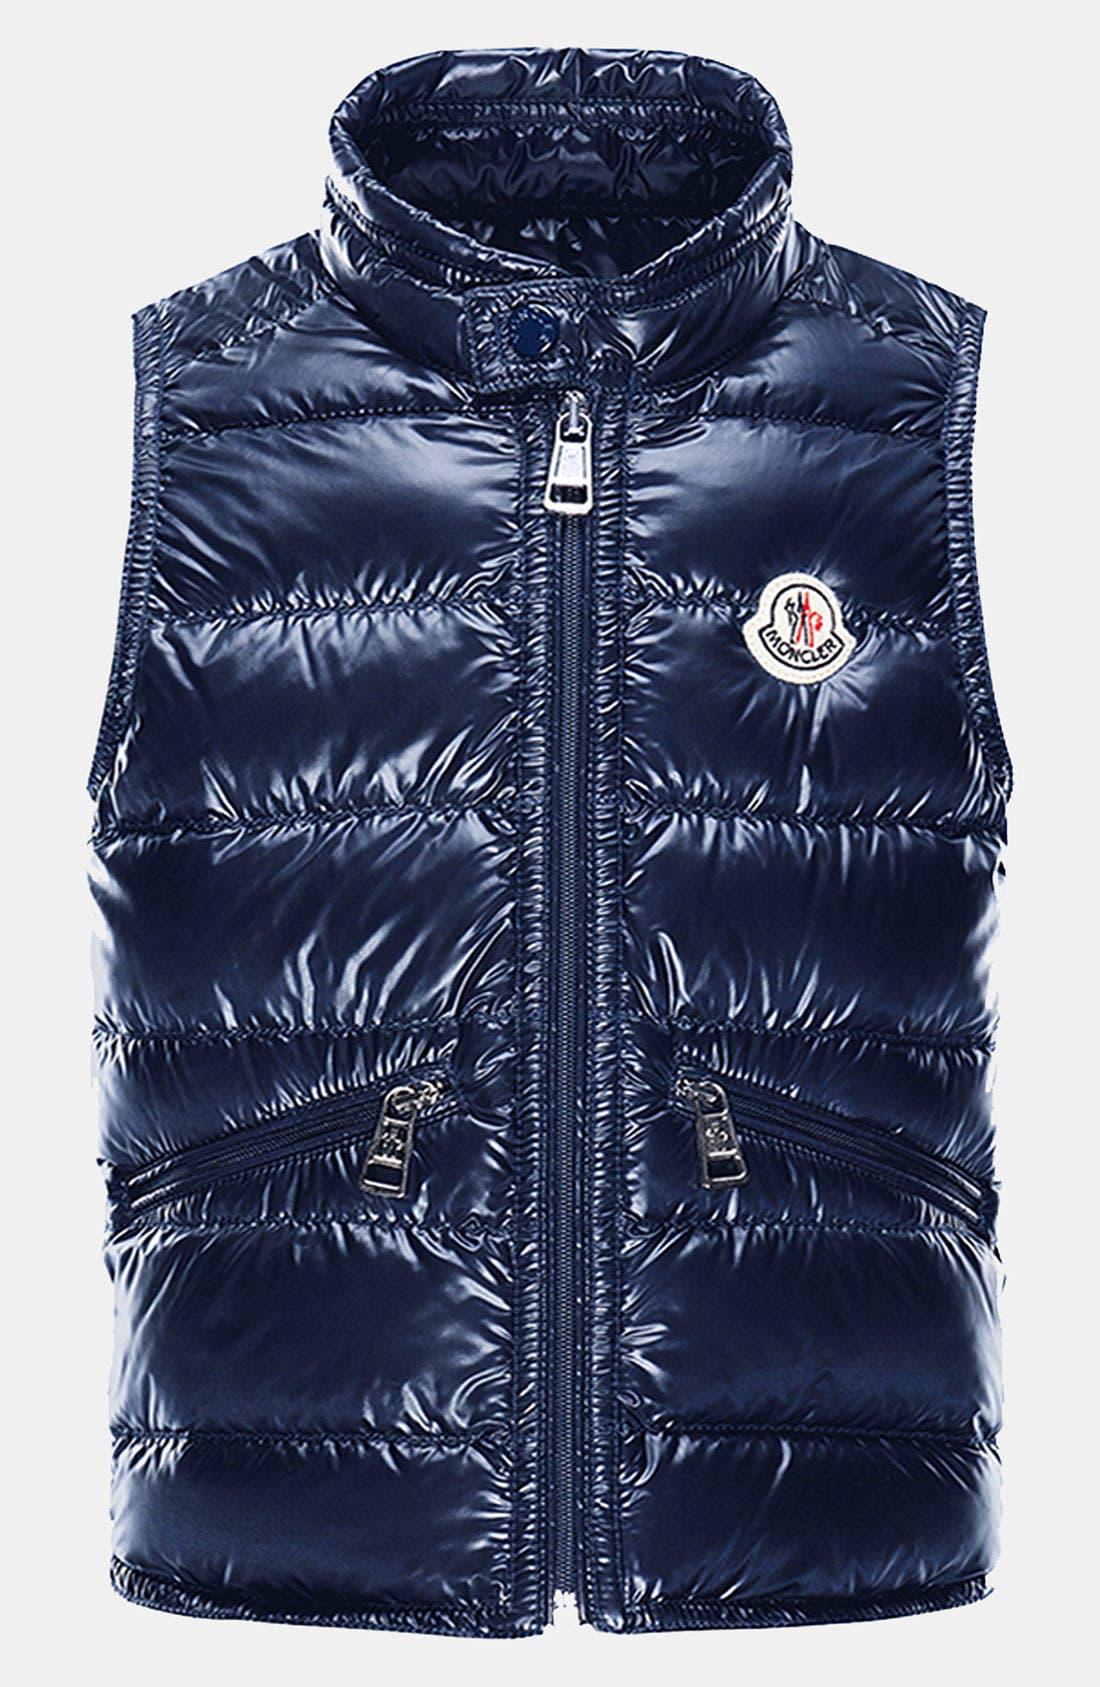 Alternate Image 1 Selected - Moncler Down Vest (Little Boys & Big Boys)